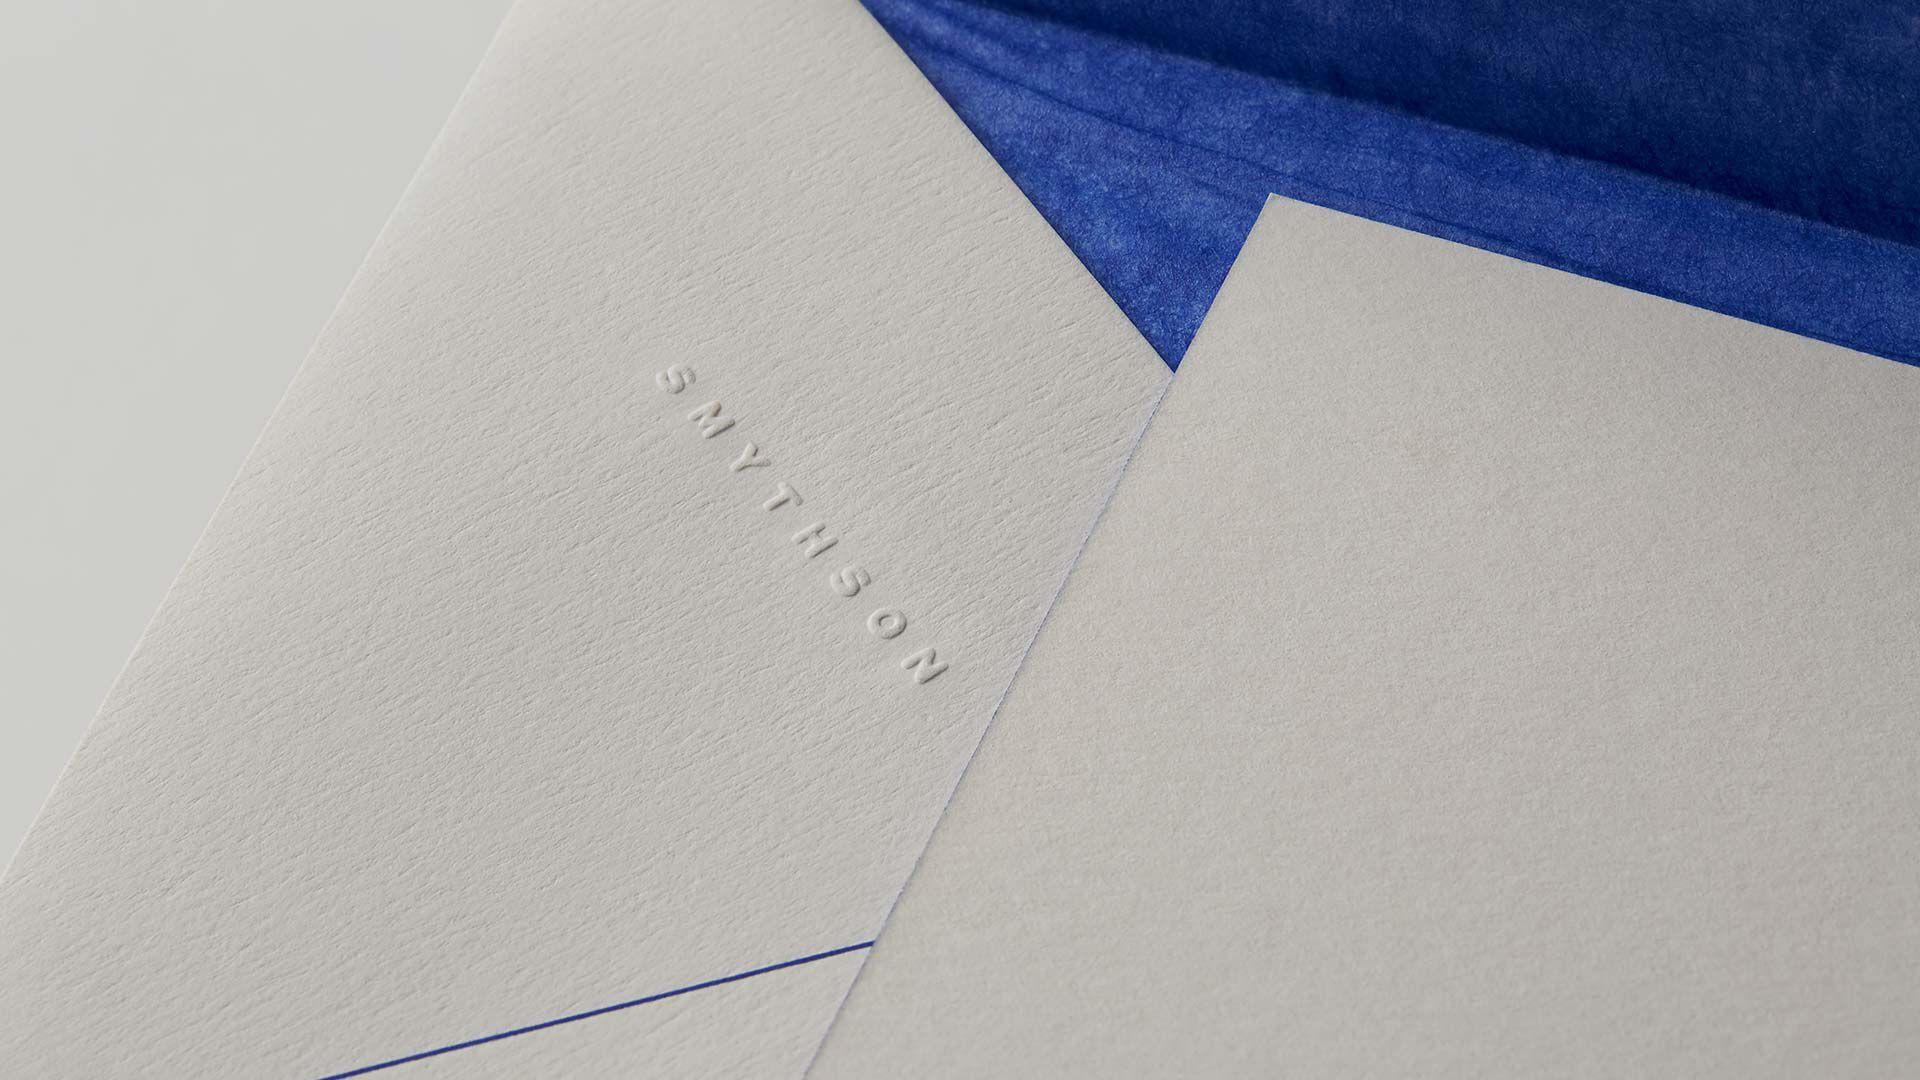 Personalised Stationery | Smythson